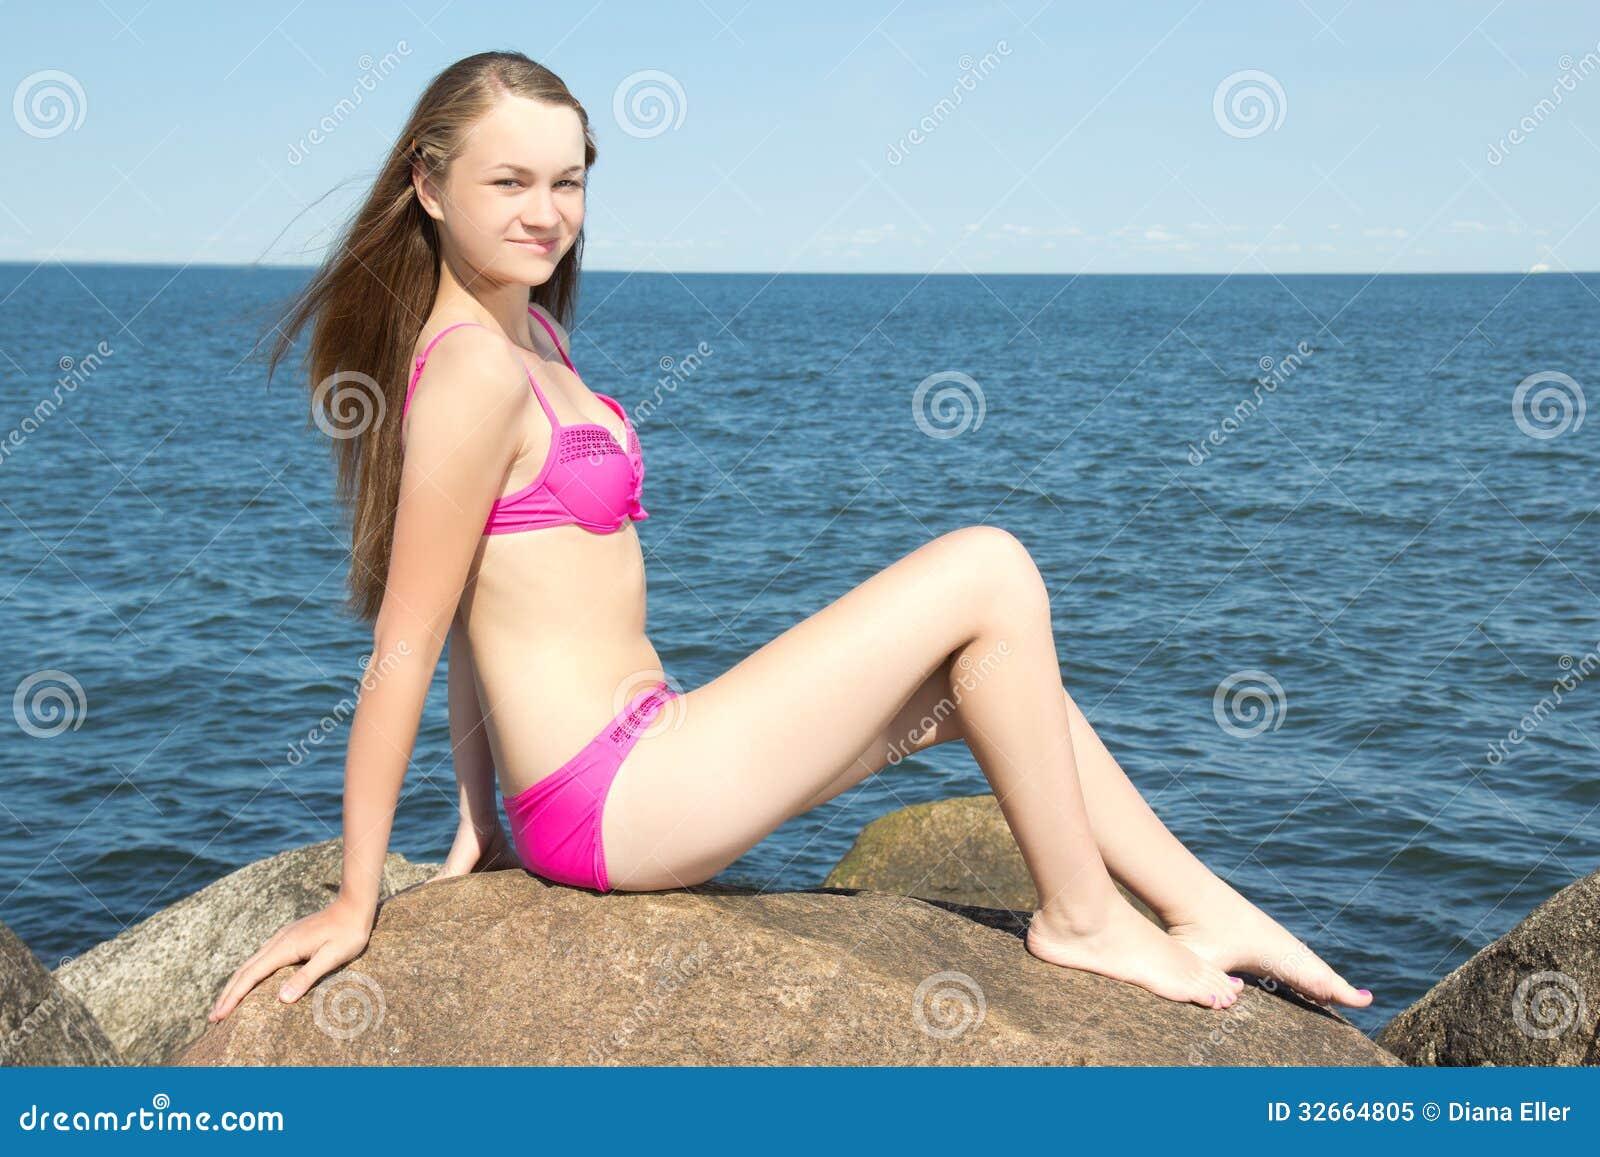 Фото модель в розовом бикини фото фото 3-650